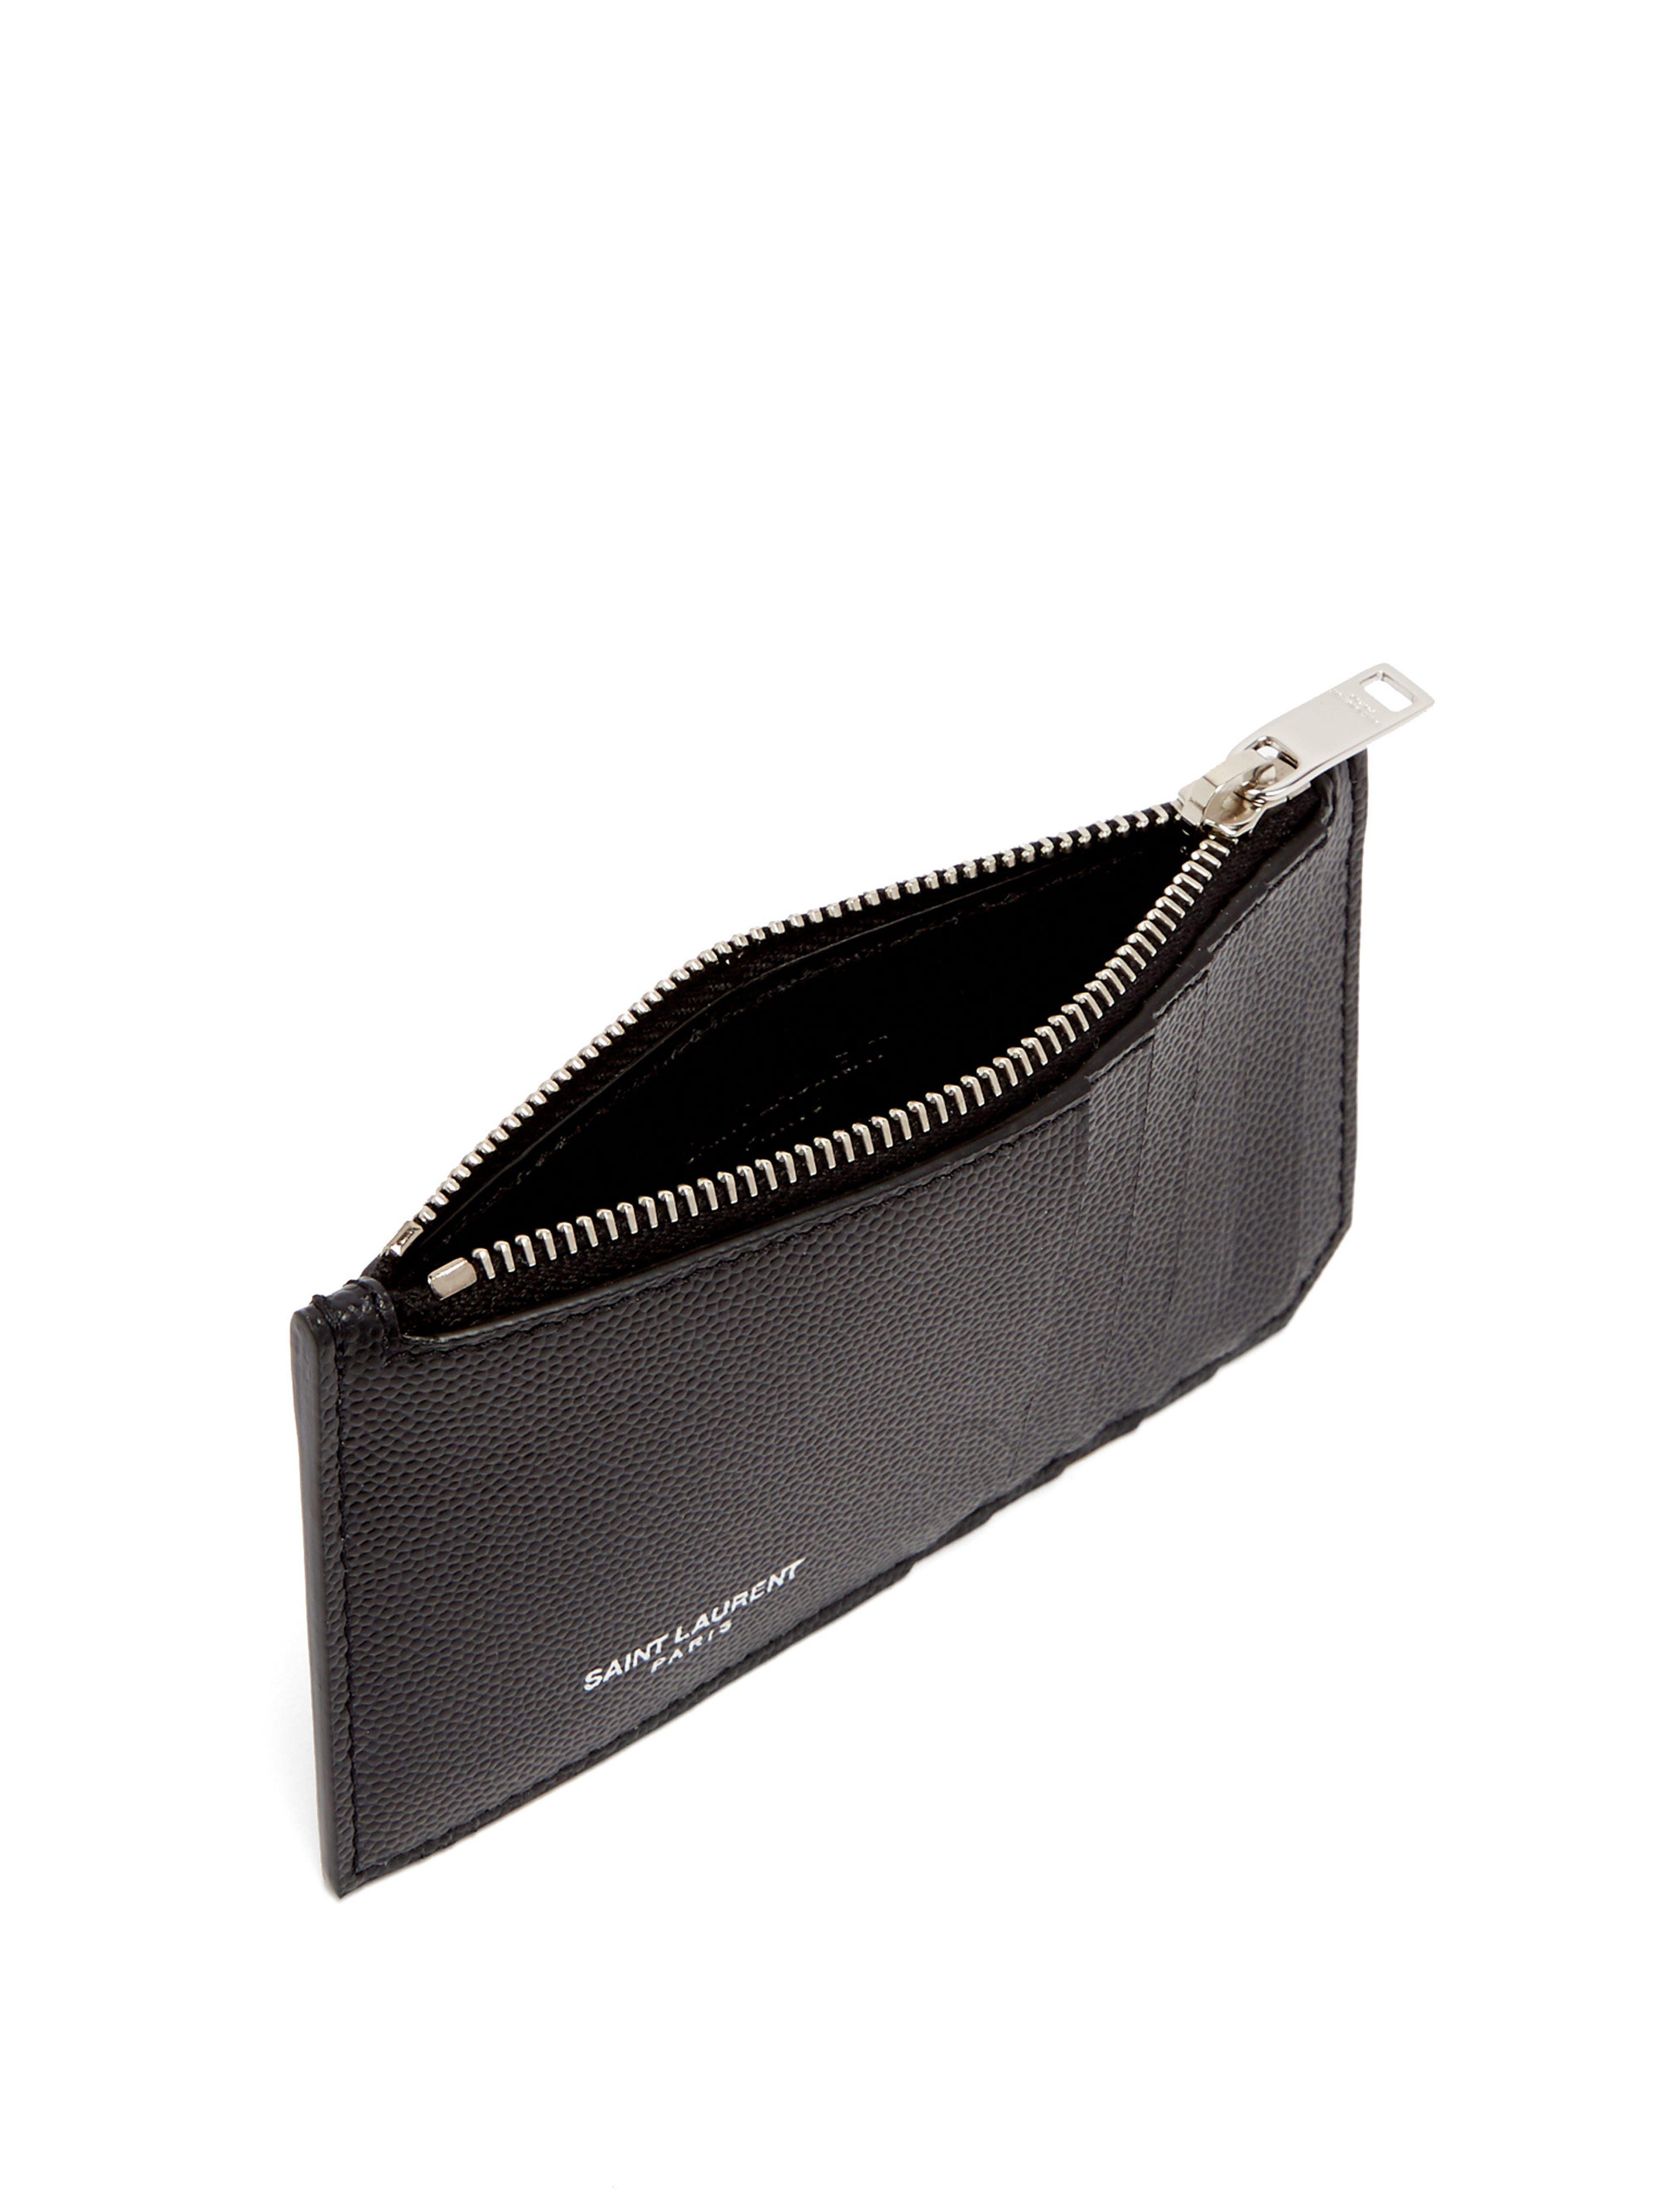 672bcf00c2c Saint Laurent Grained Leather Cardholder in Black for Men - Save 31% - Lyst